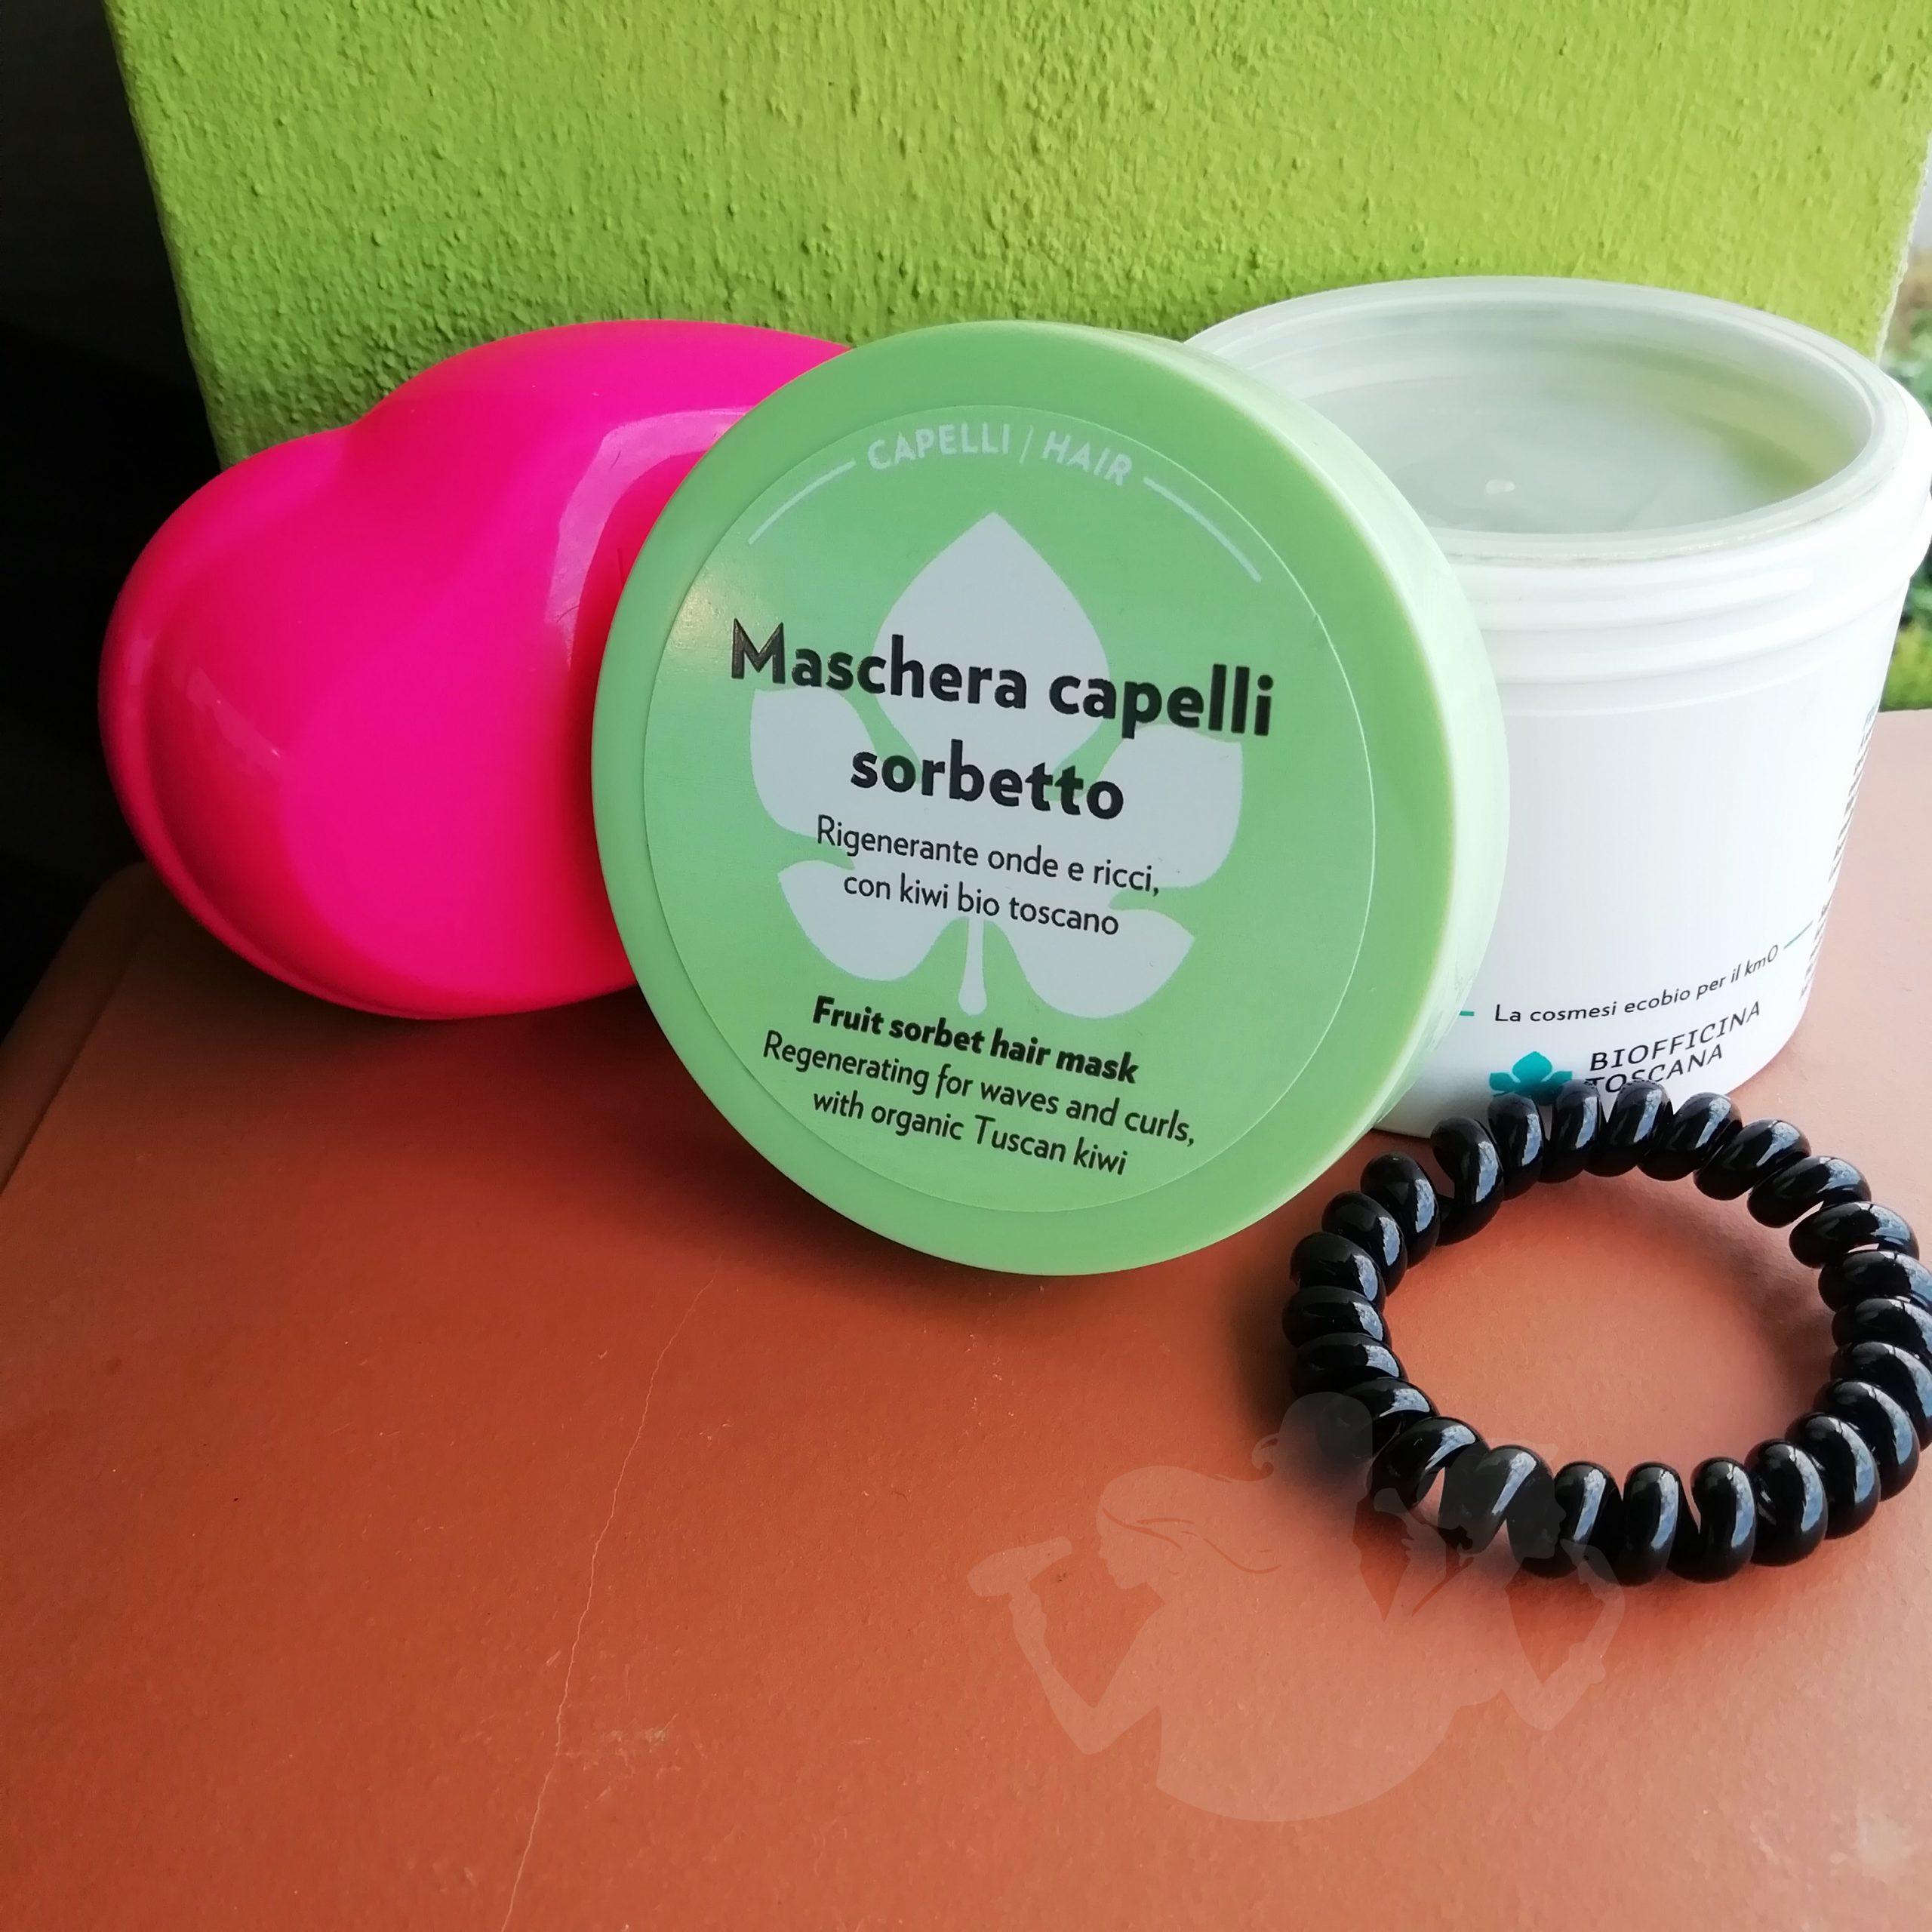 Maschera capelli sorbetto – Biofficina Toscana